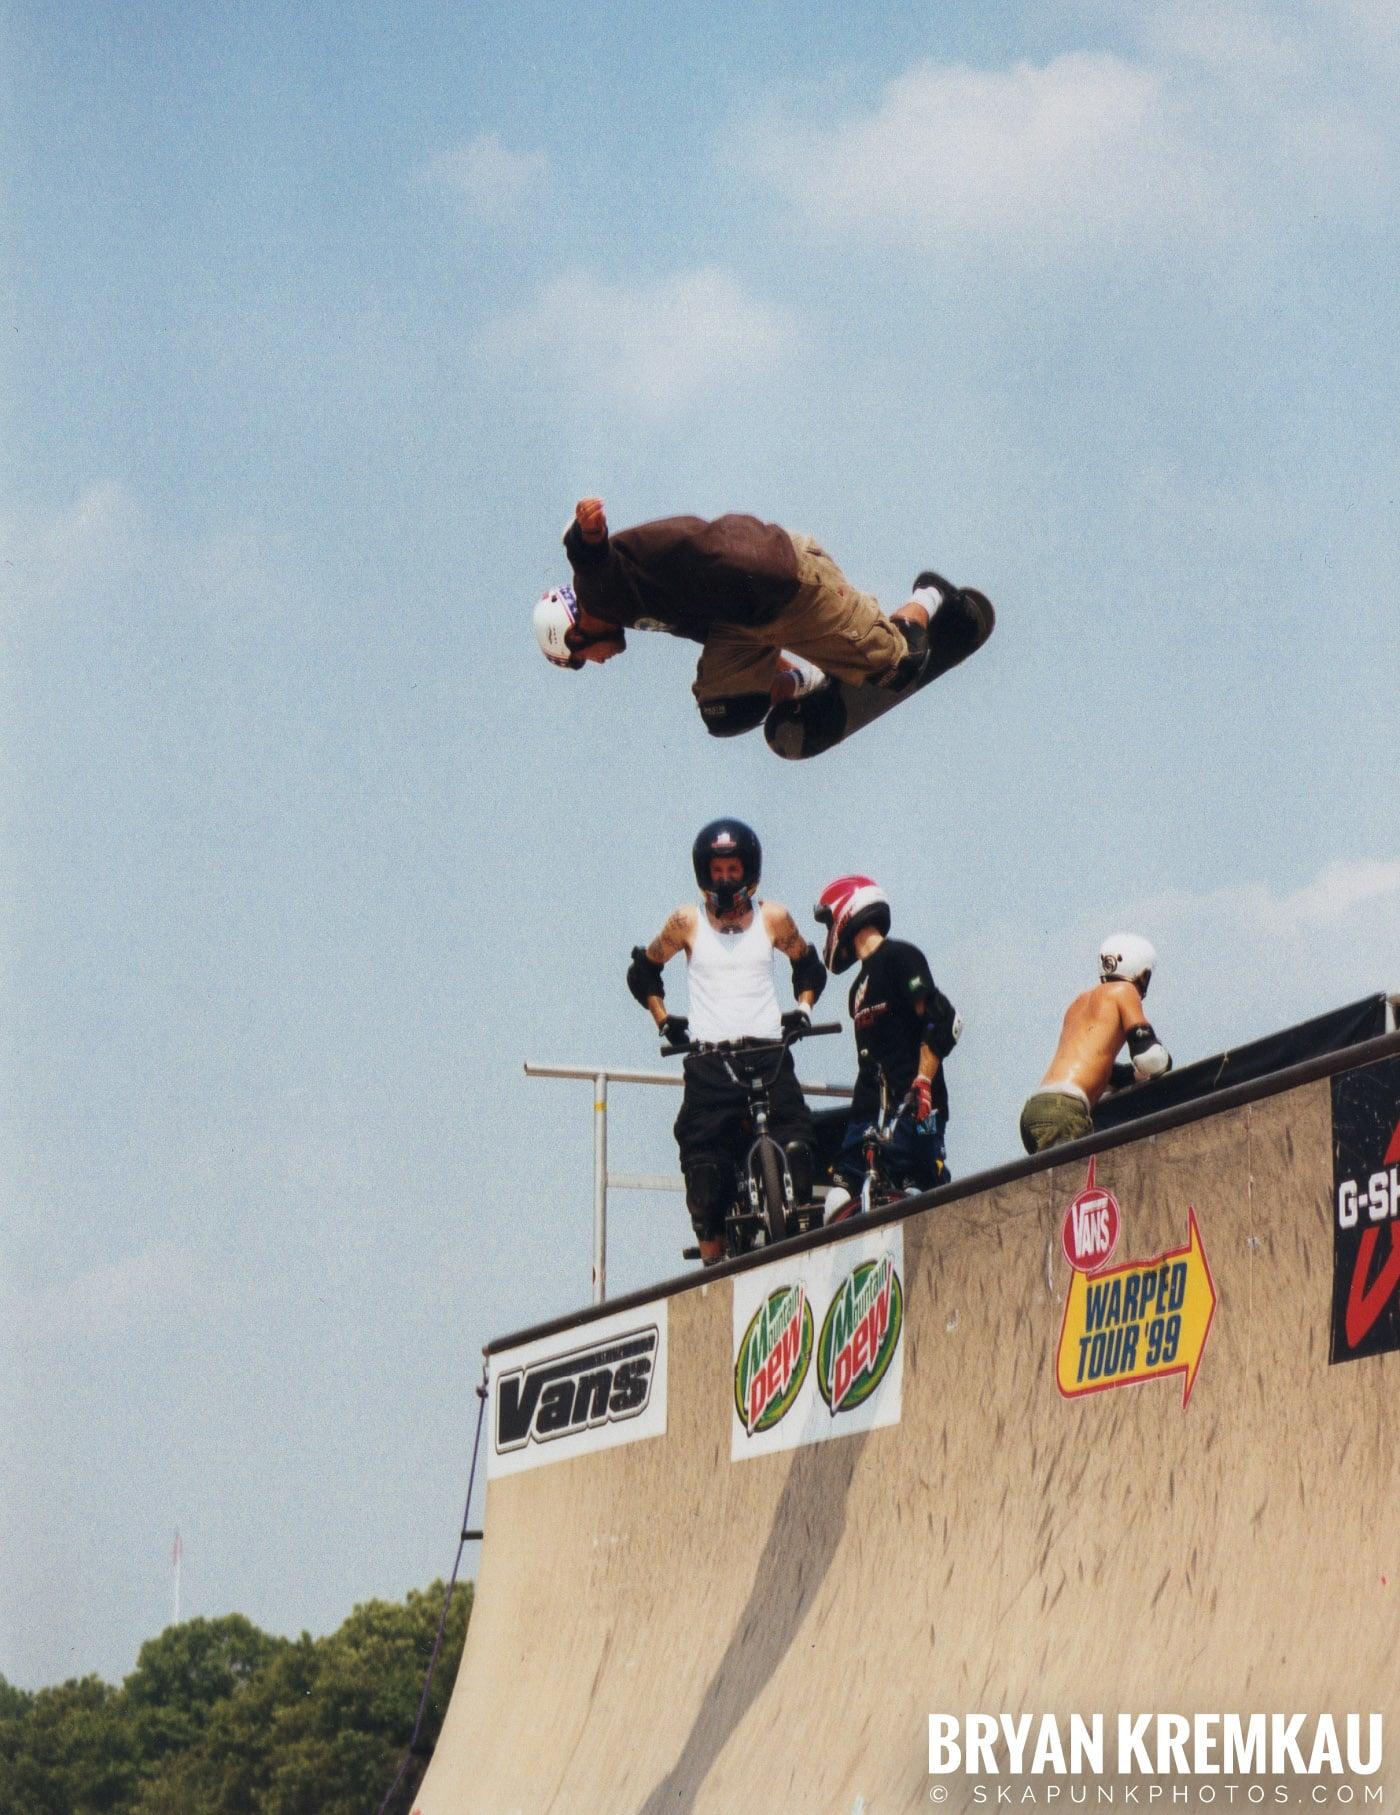 Skaters @ Vans Warped Tour, Randall's Island, NYC - 7.16.99 (2)